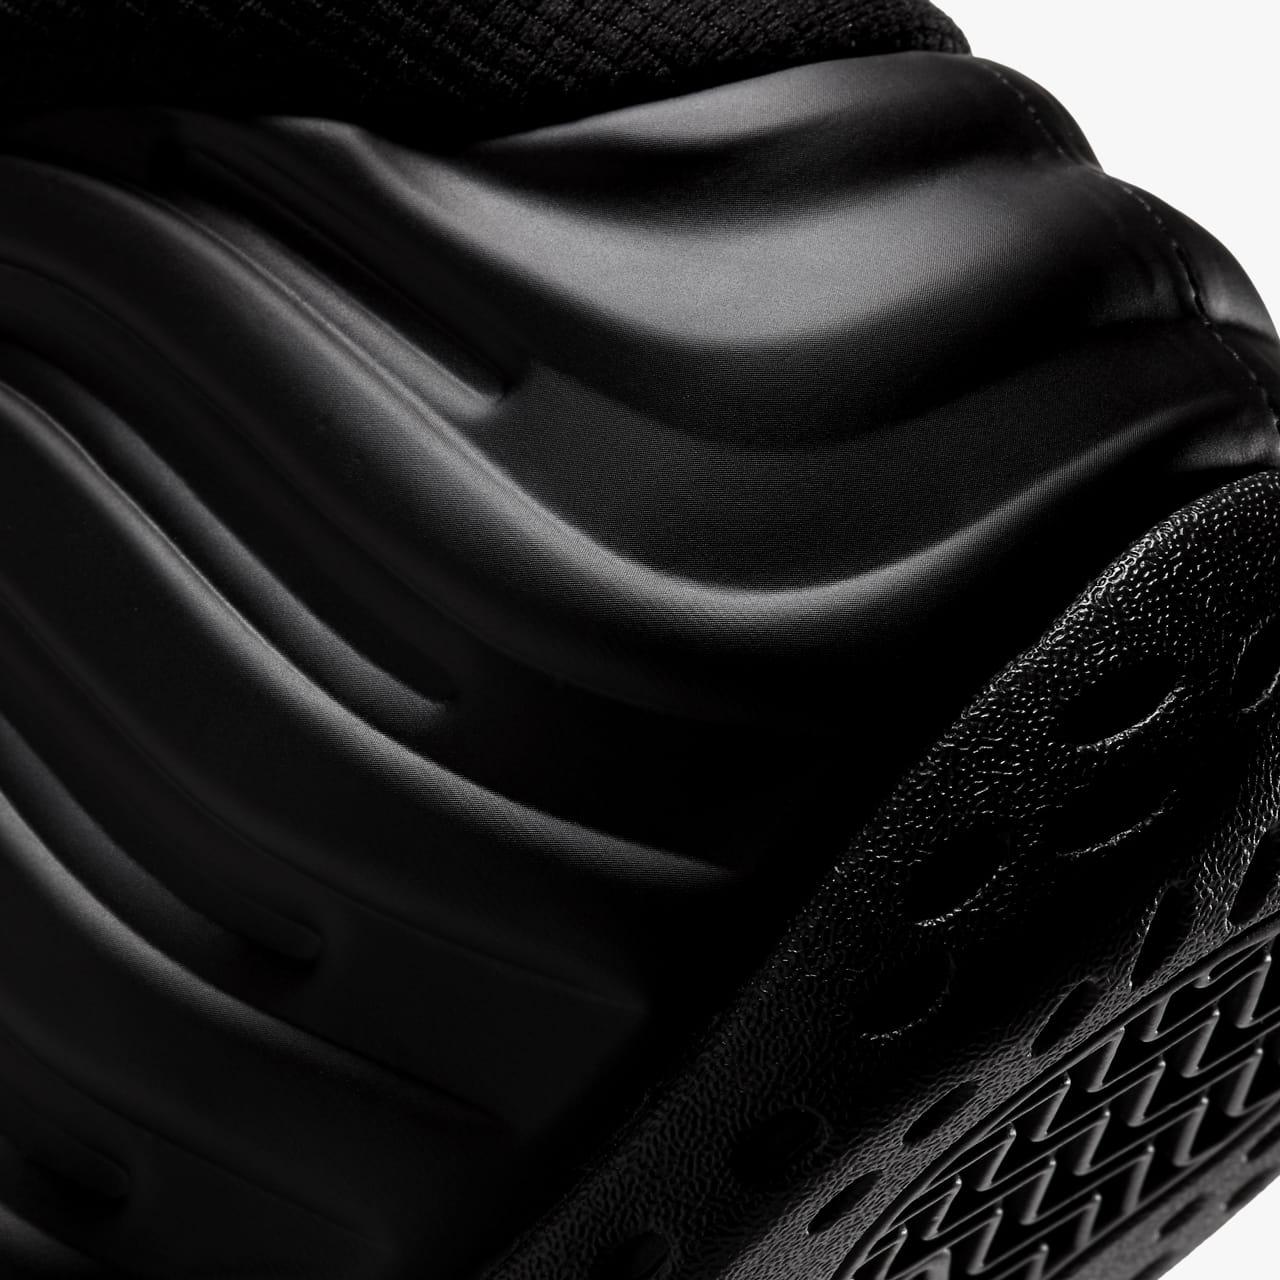 Nike Air Foamposite One Glow in the Dark Custom ...